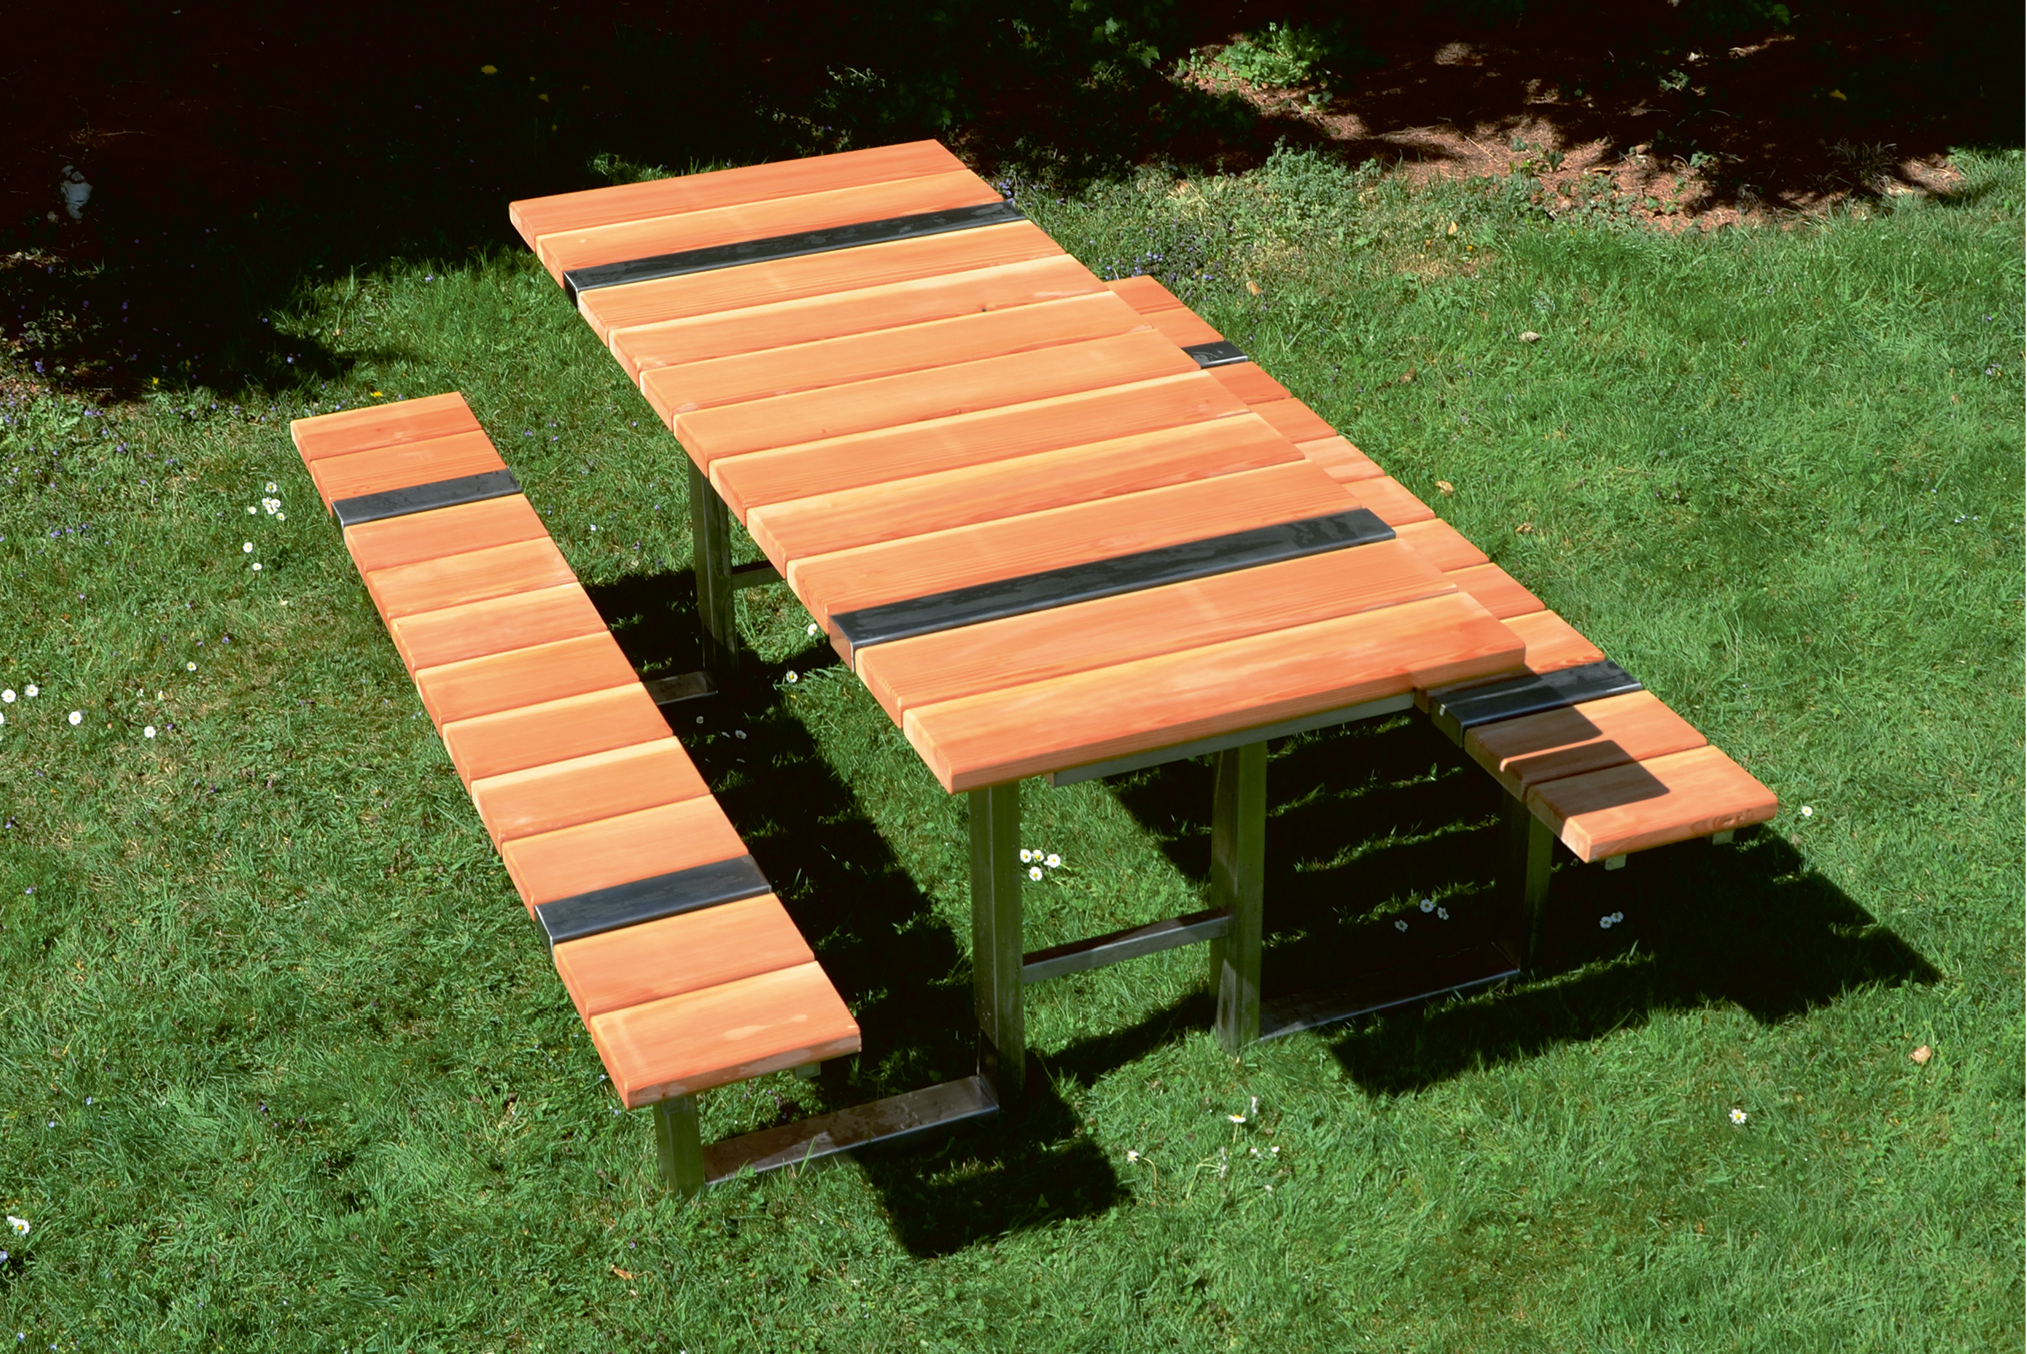 picknicktisch tibro fuchs thun. Black Bedroom Furniture Sets. Home Design Ideas